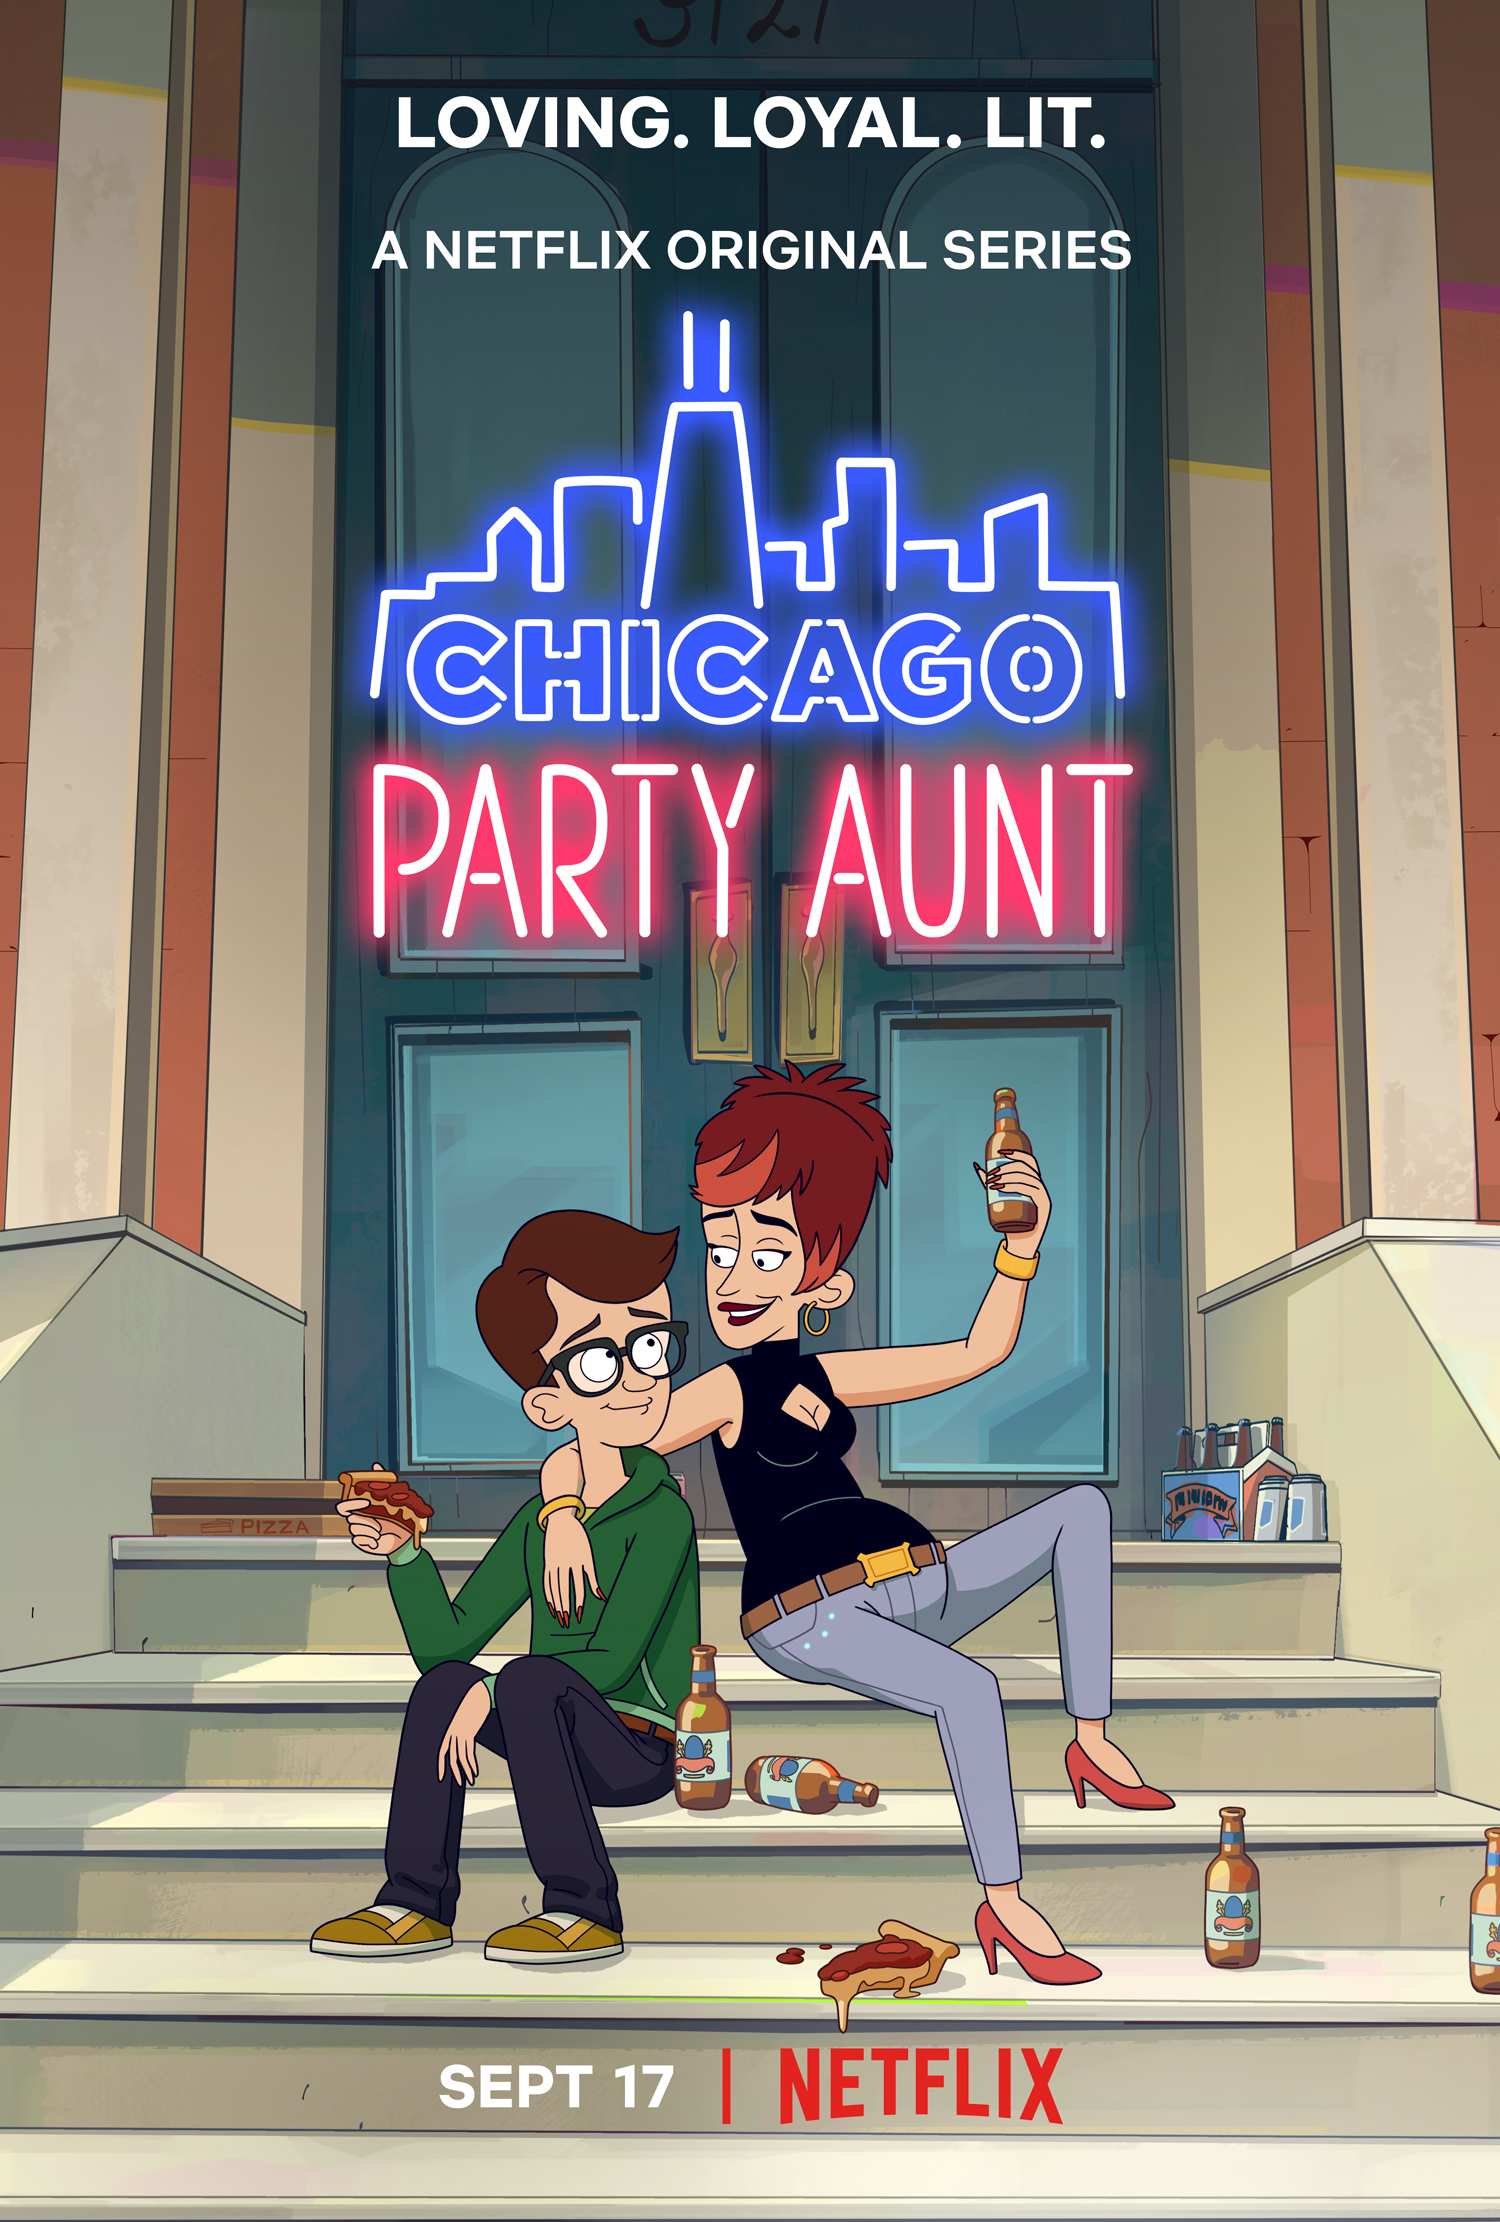 EXCLUSIVE: Netflix's Chicago Party Aunt Showrunner Matt Craig Talks About Season 1